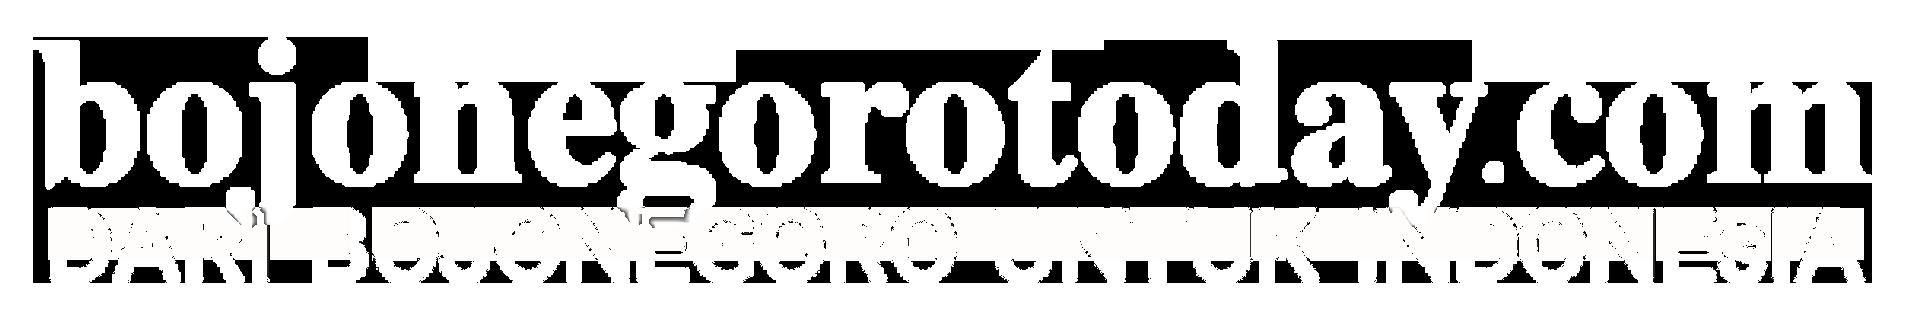 bojonegorotoday.com